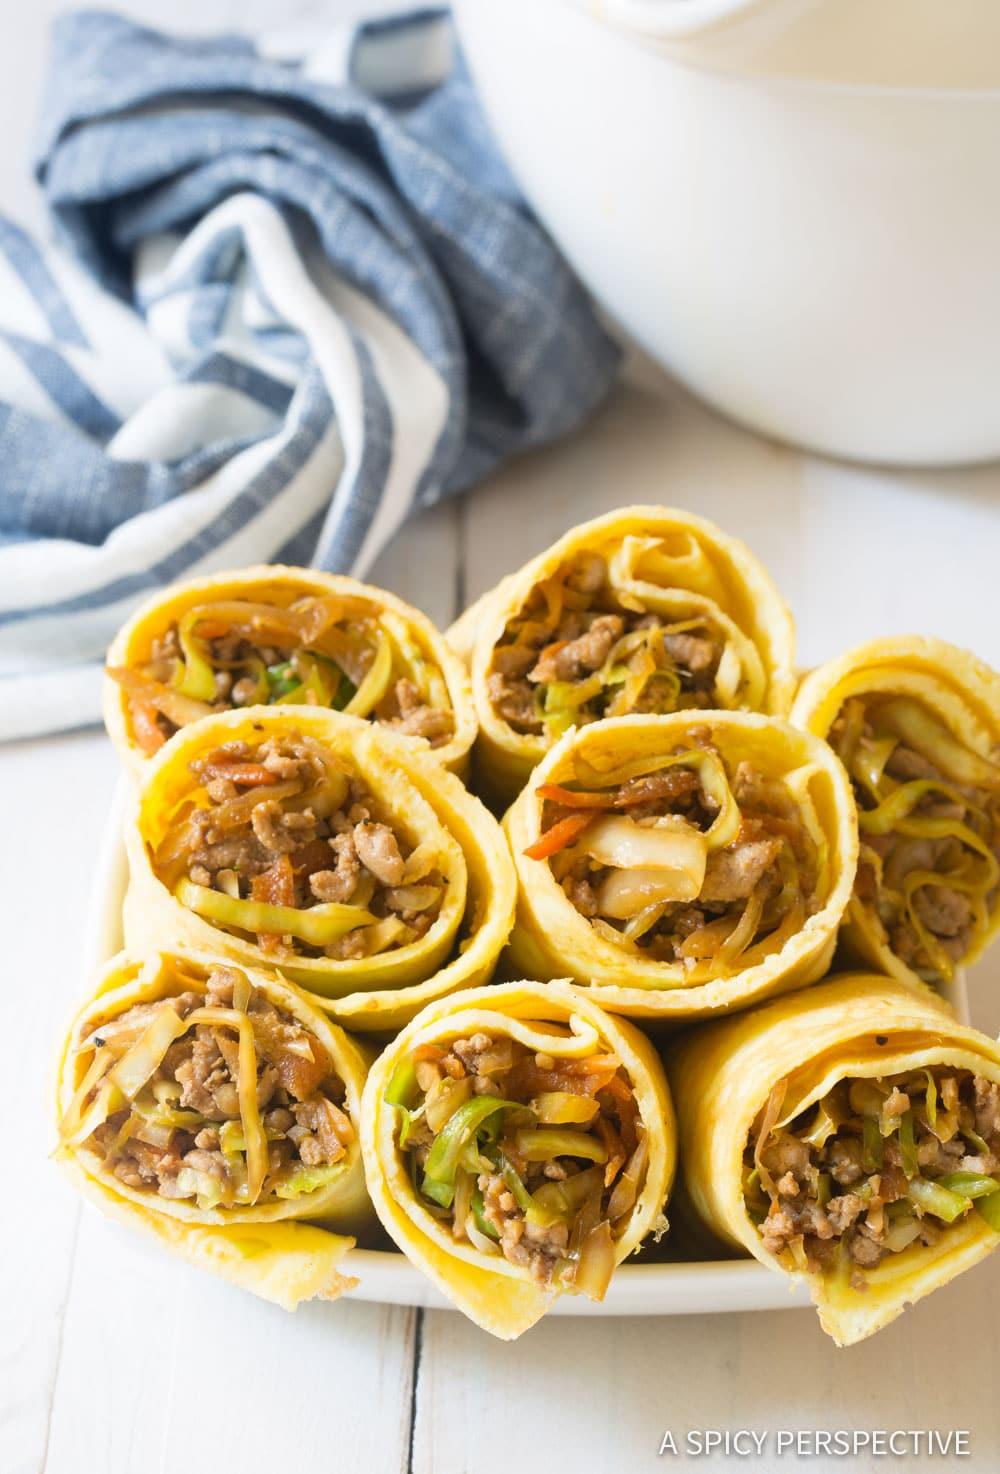 Keto Egg Roll Wrap Recipe #ASpicyPerspective #Ketogenic #Paleo